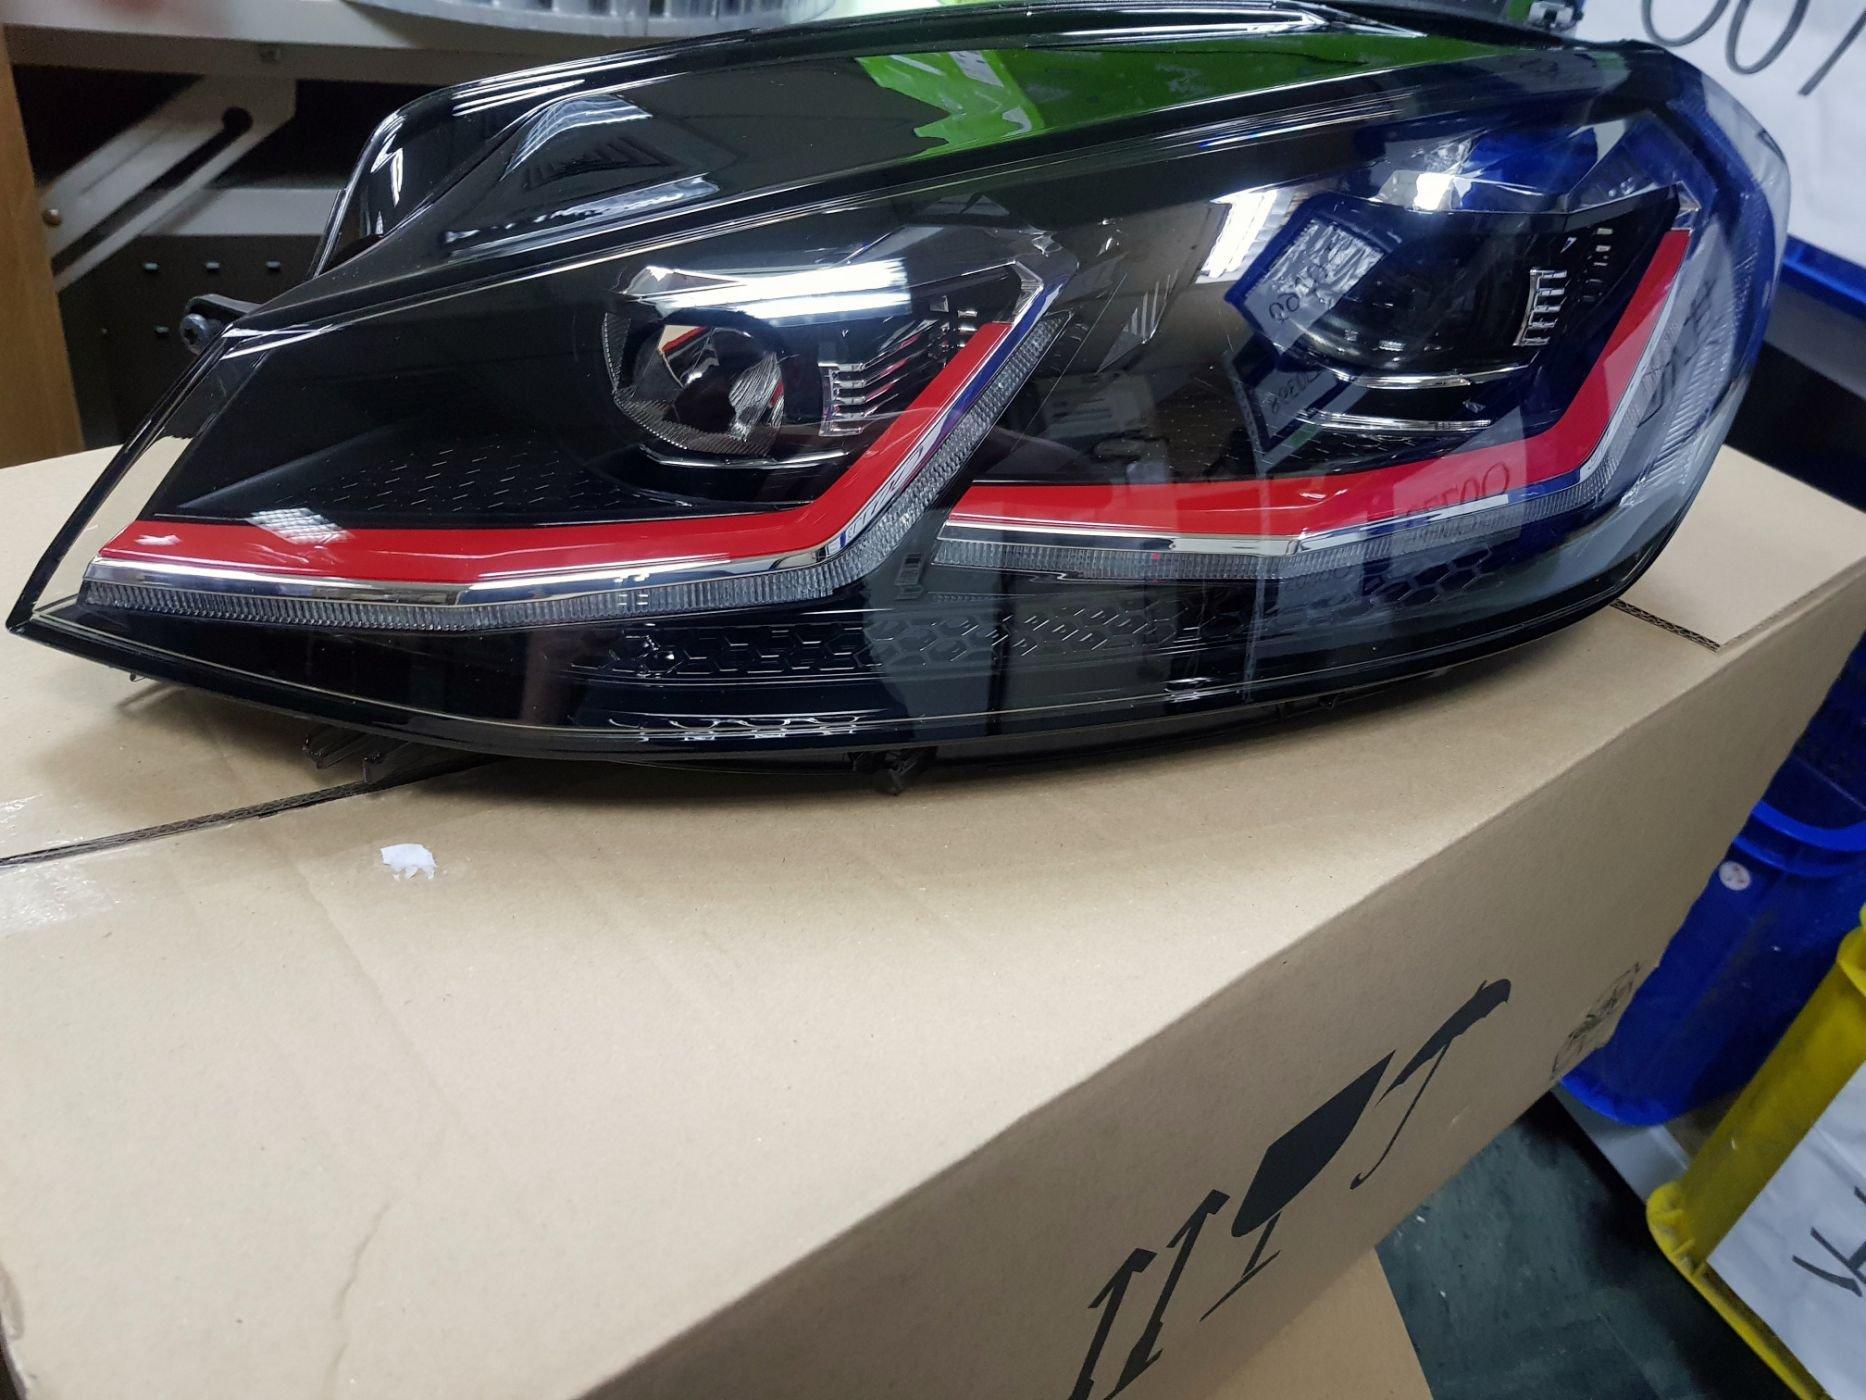 VW GOLF GTI 7.5代 原廠大燈 原廠件